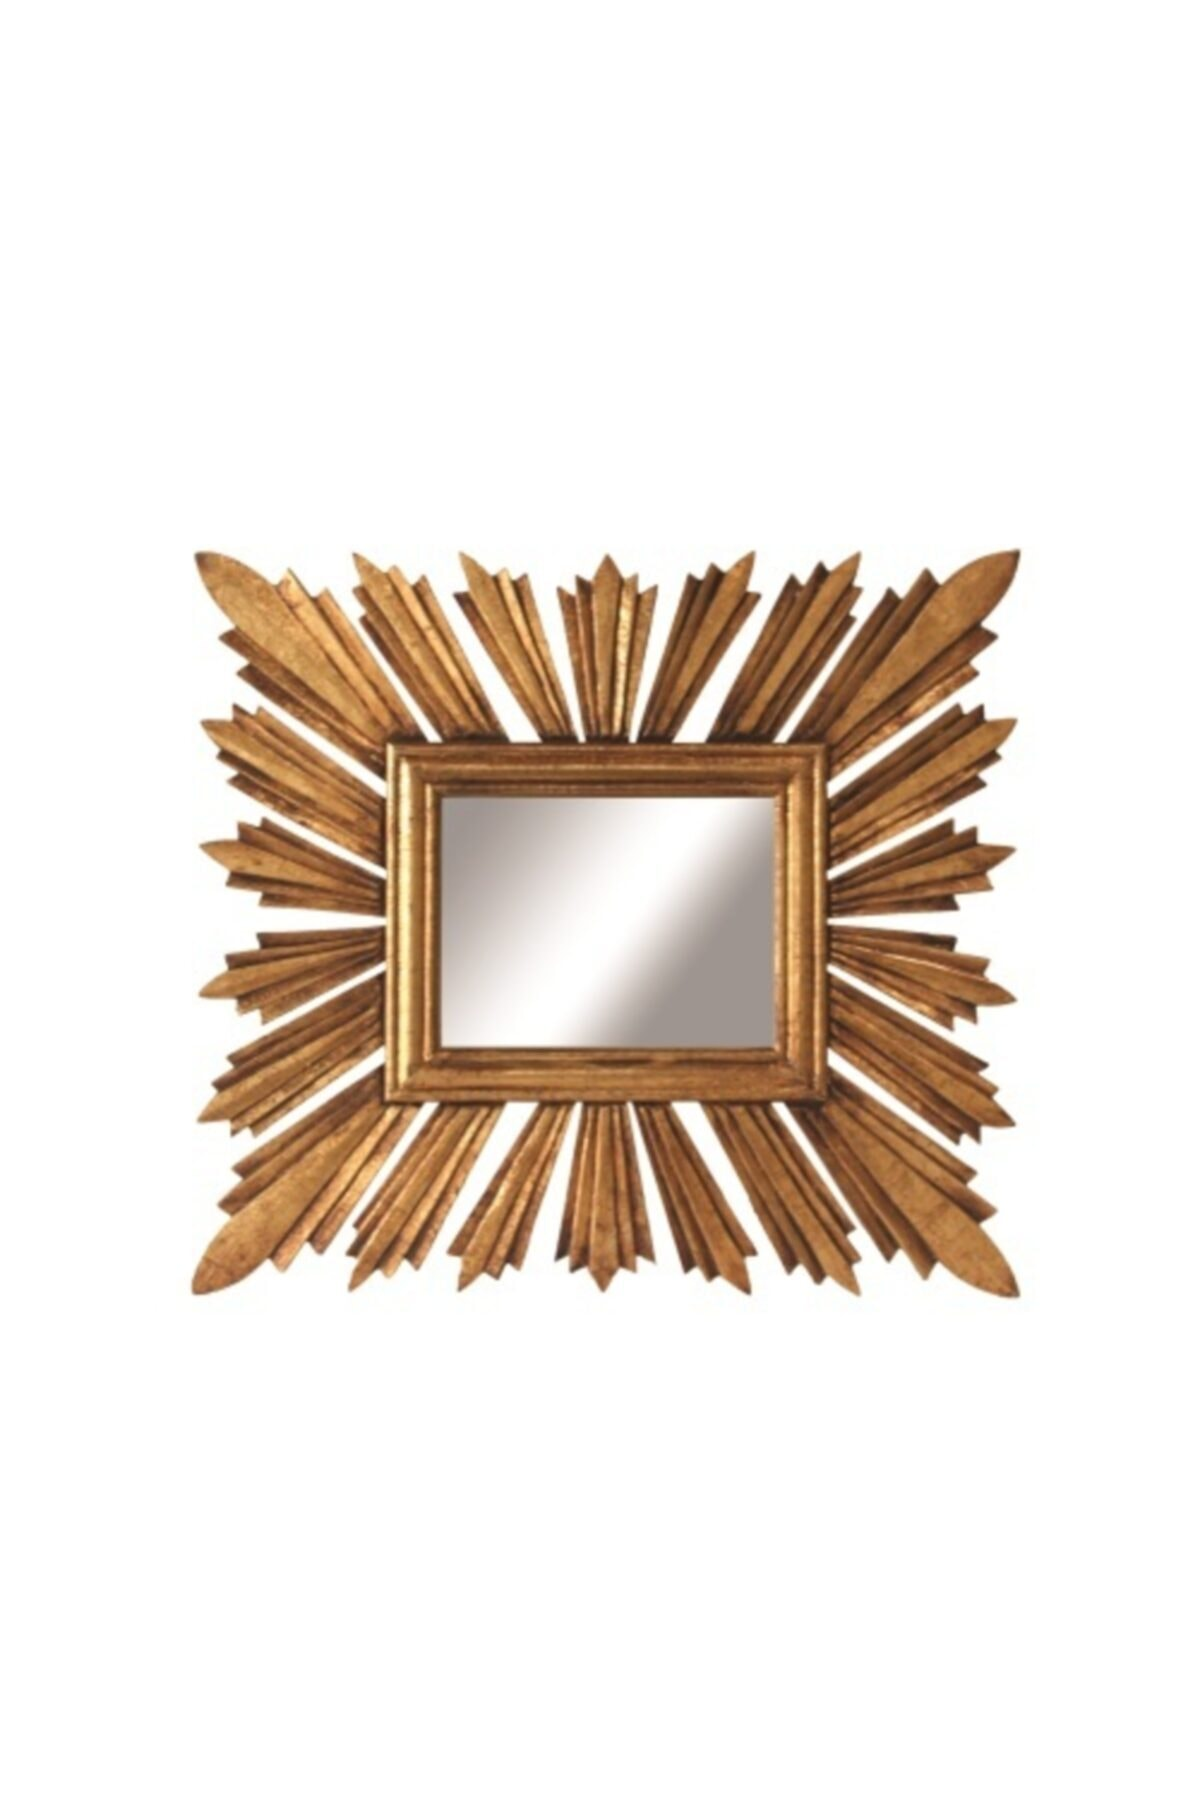 Warm Design Güneş Motifli Ayna 1